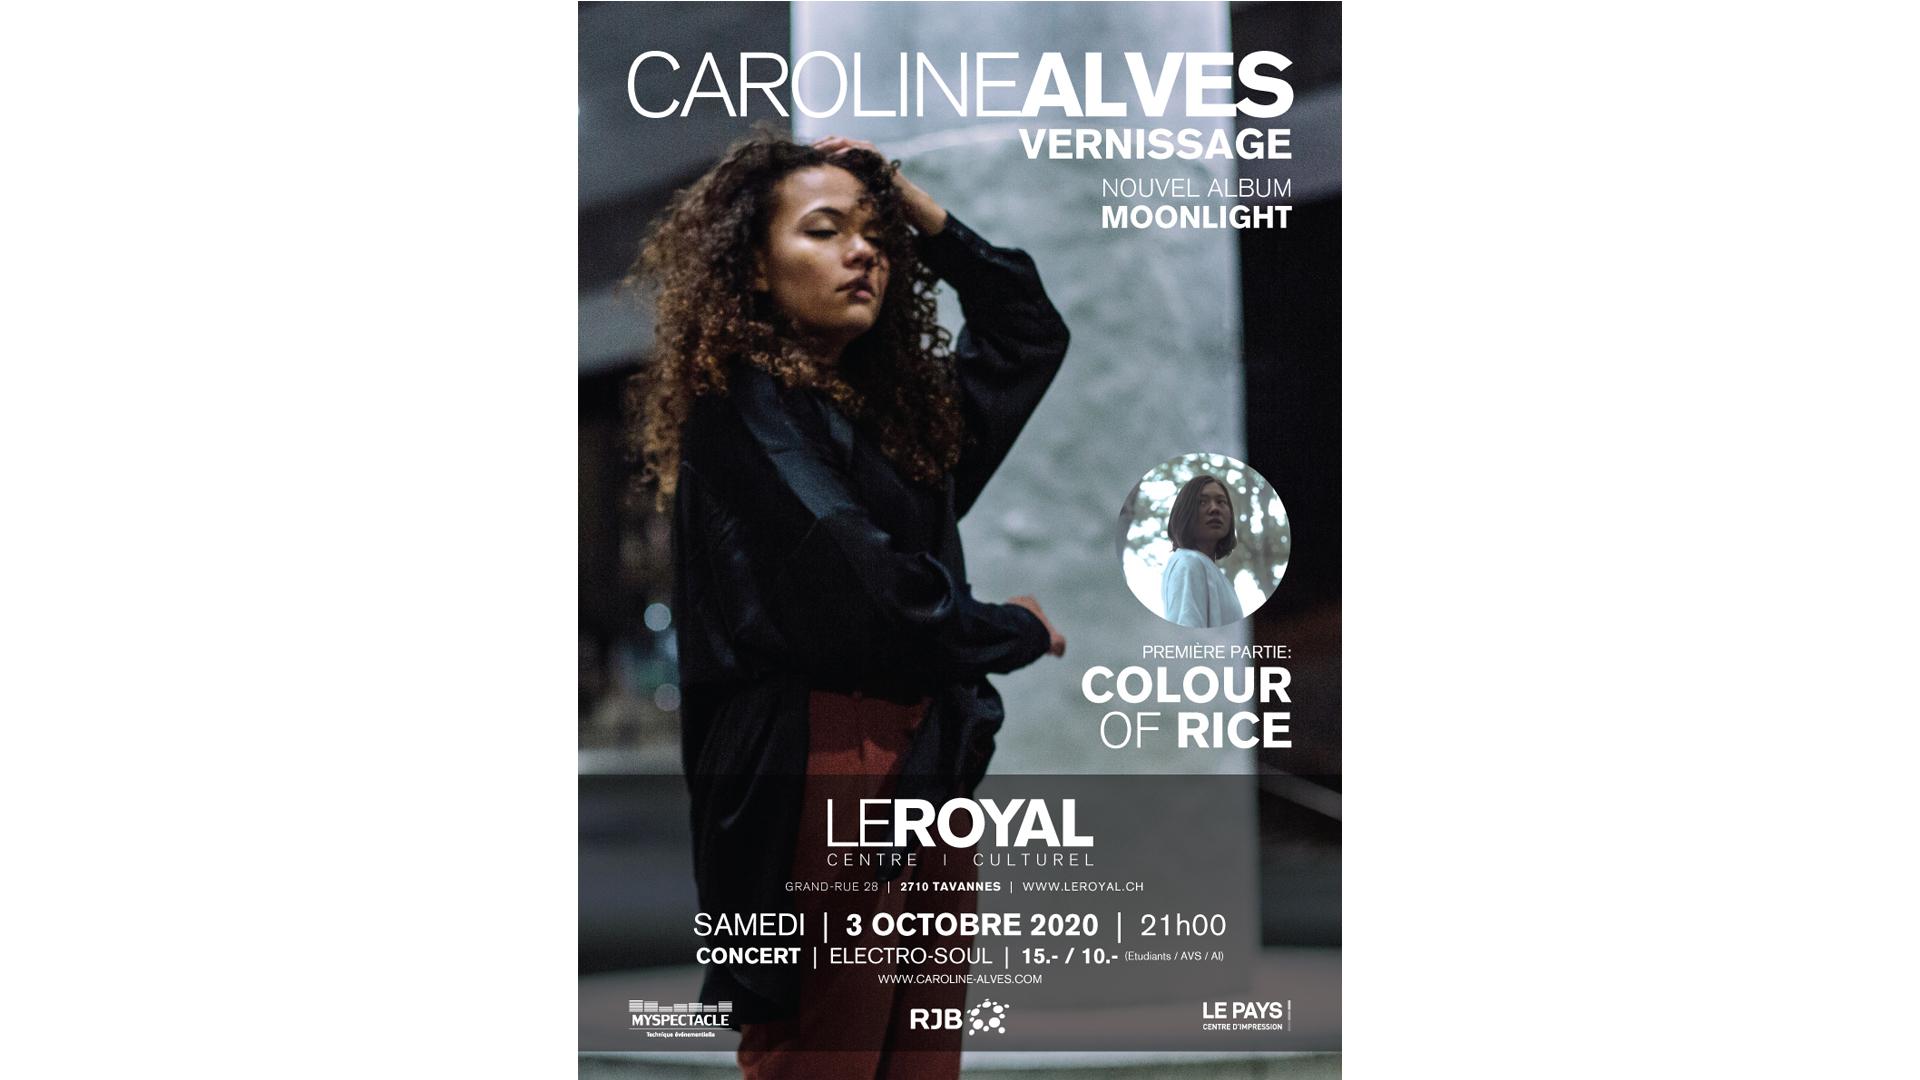 201003---CAROLINE-ALVES---Affiche-WEB